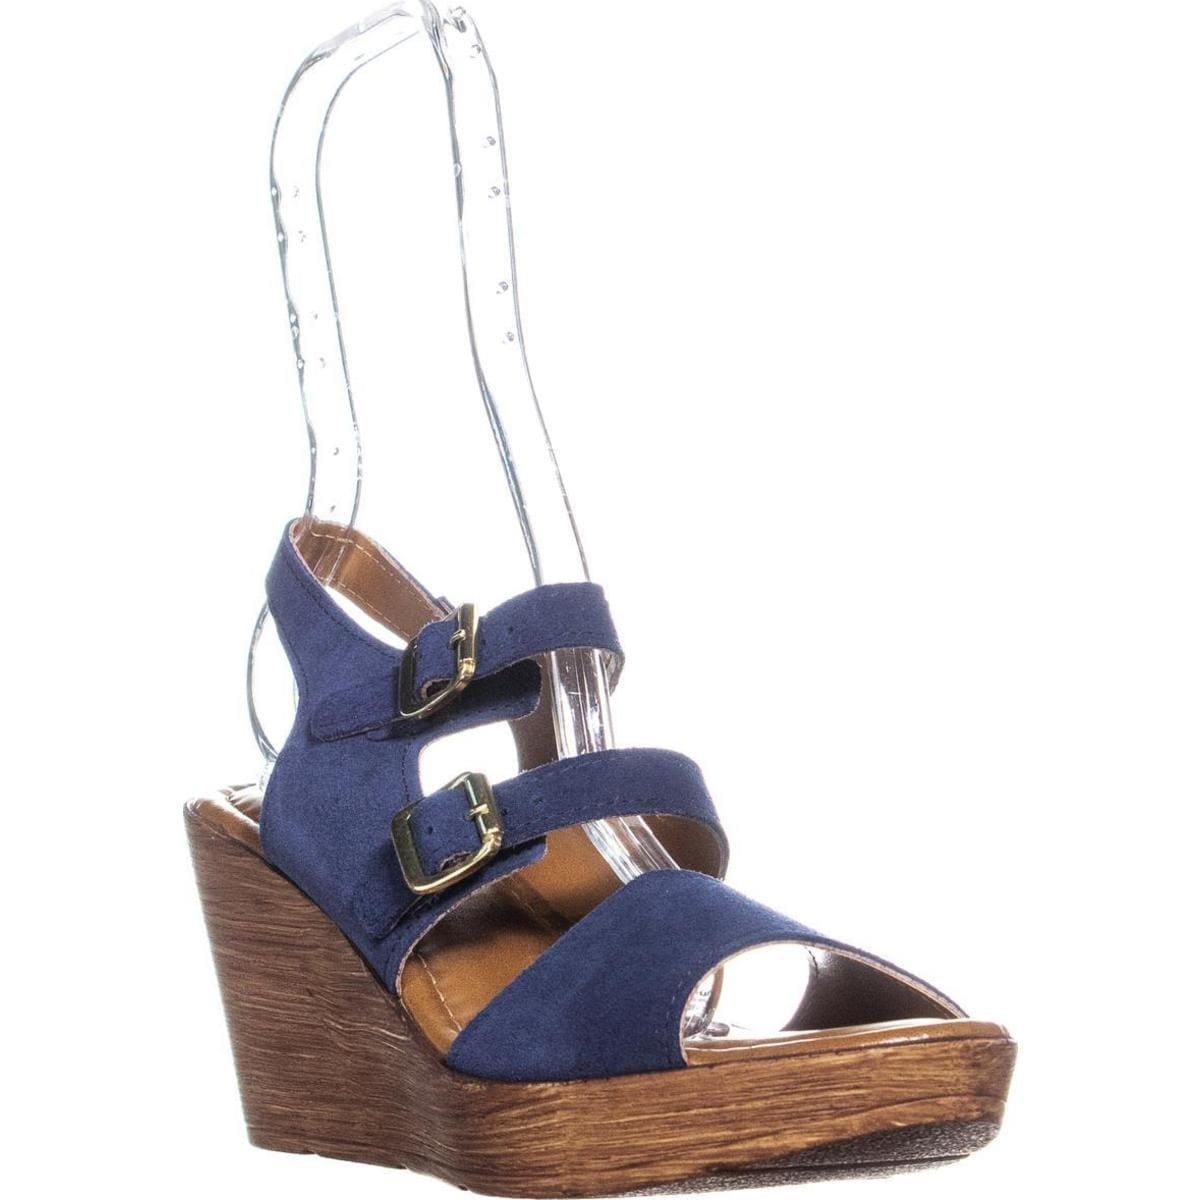 5536f91468e38 Shop Bella Vita Ani-Italy Double Buckle Peep Toe Wedge Sandals